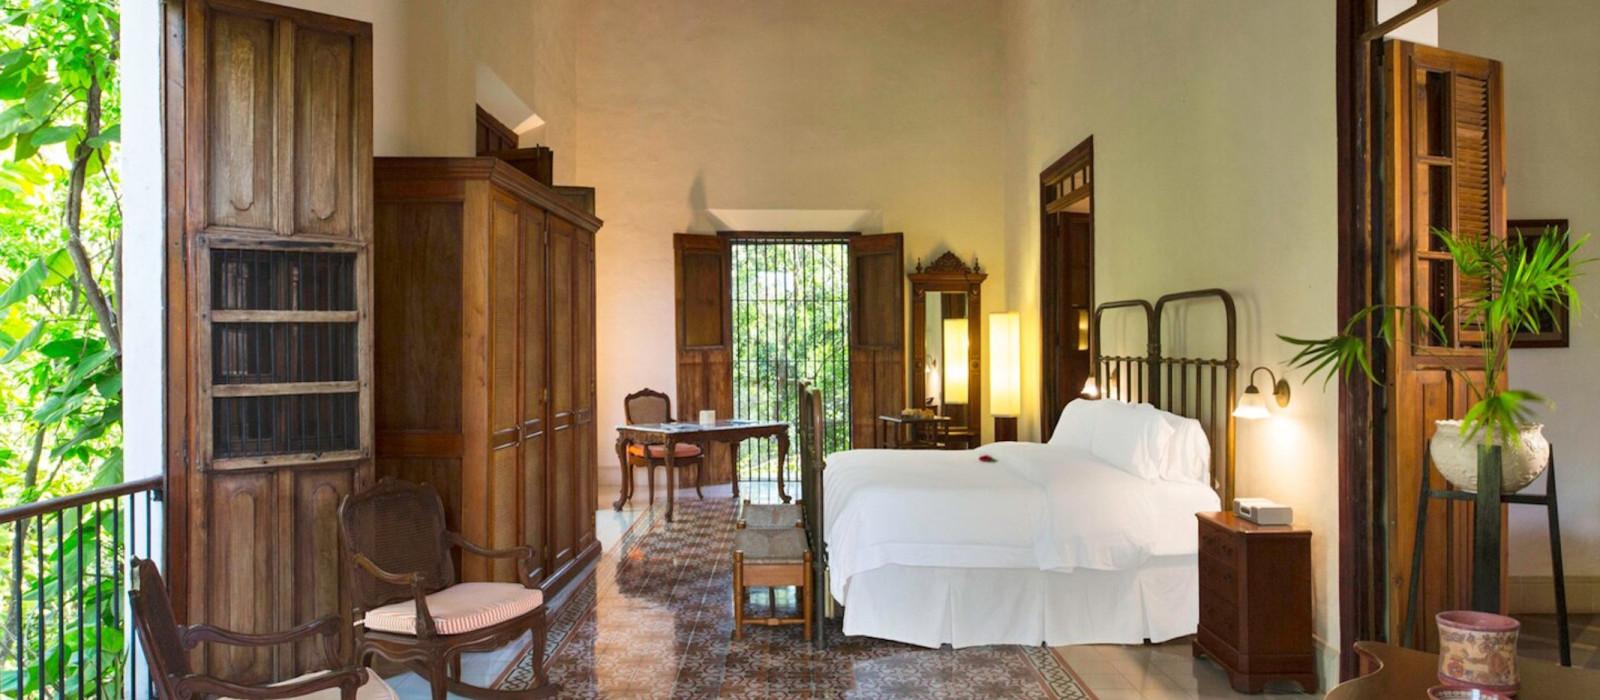 Hotel Hacienda Temozon Mexiko